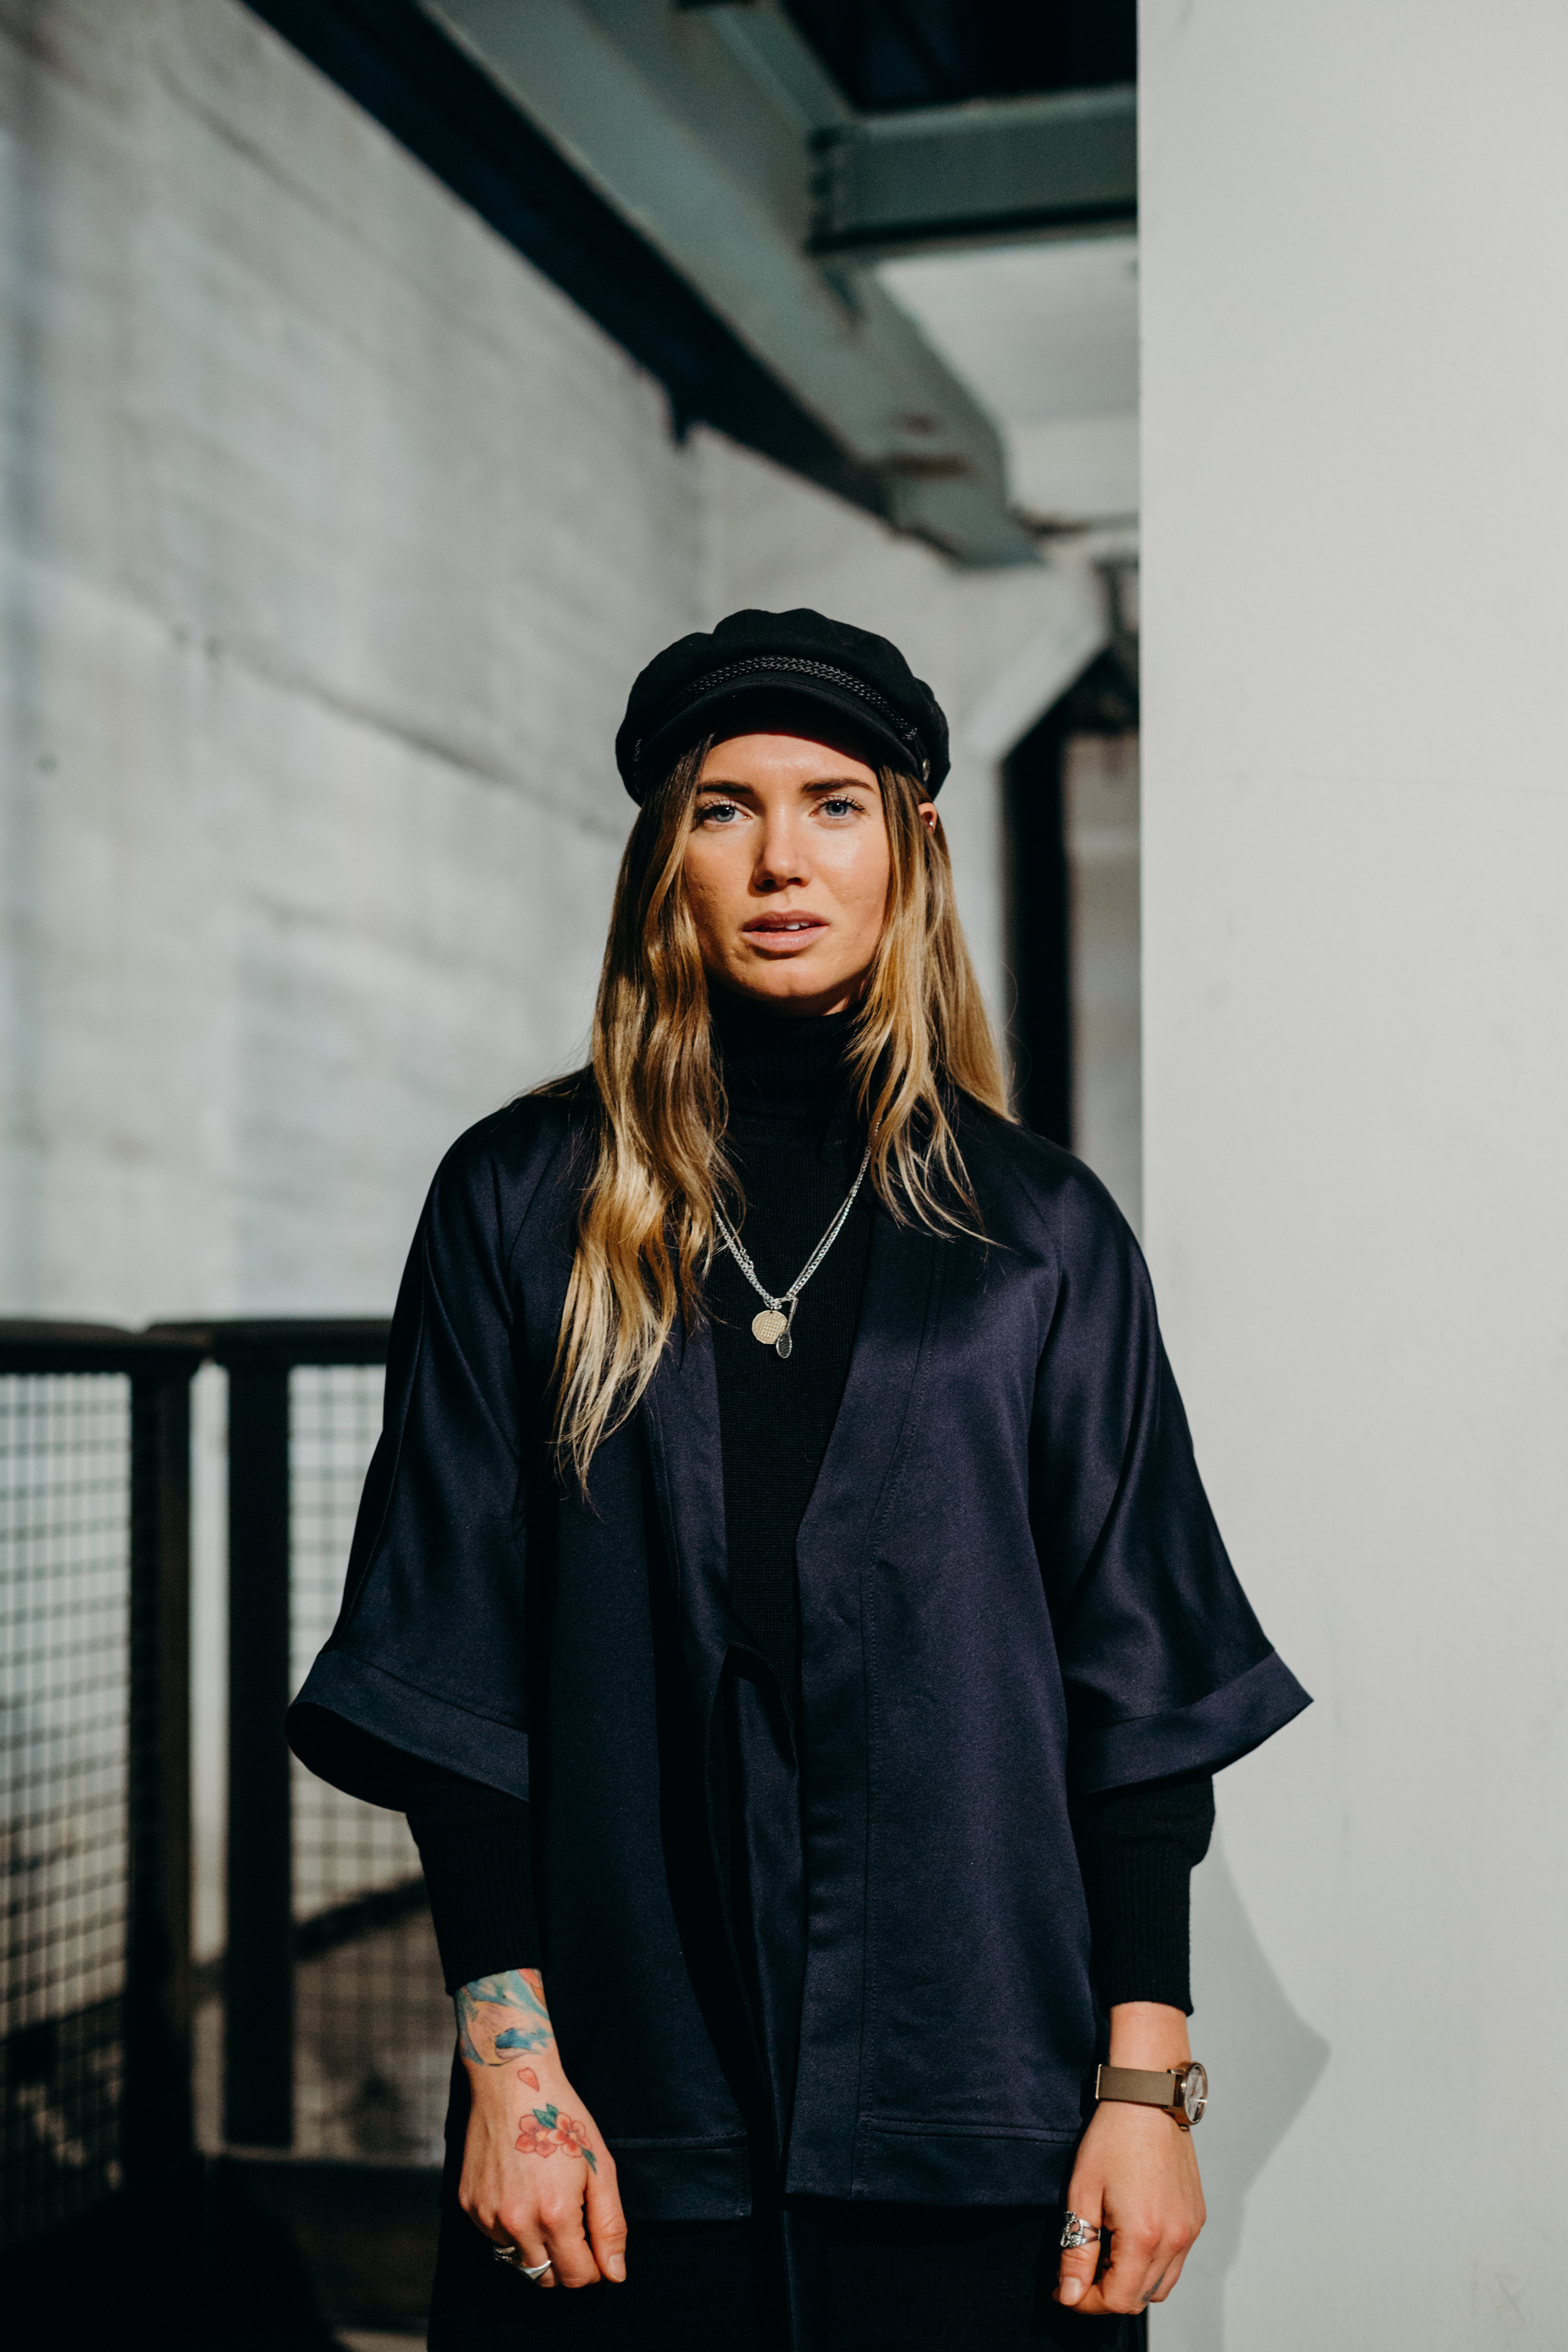 Laura Diehm  ©️Lydia Hersberger